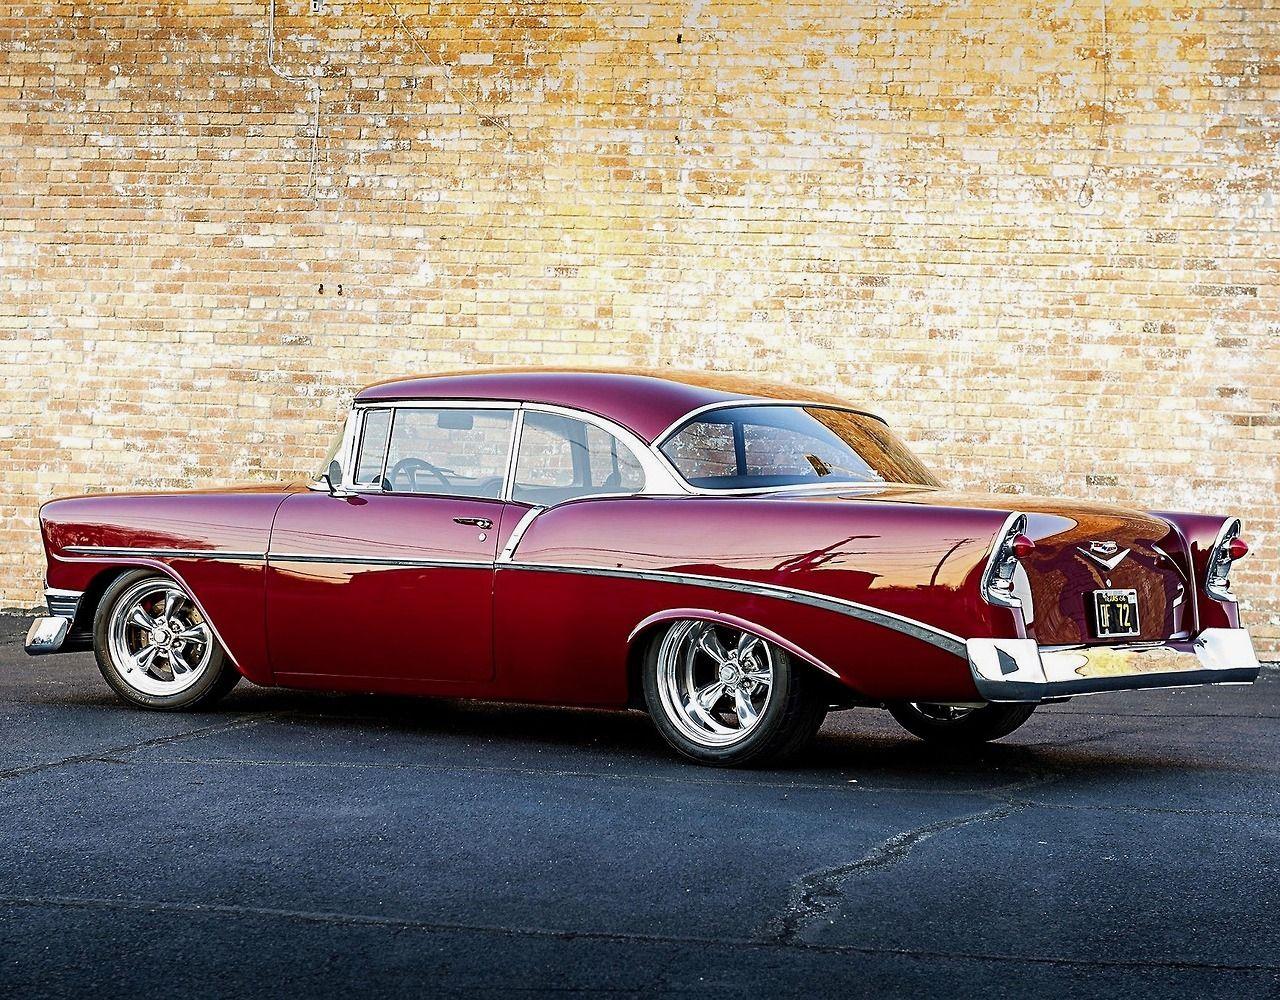 '56 Chevrolet Bel Air Custom © Ro McGonegal Pontiac cars